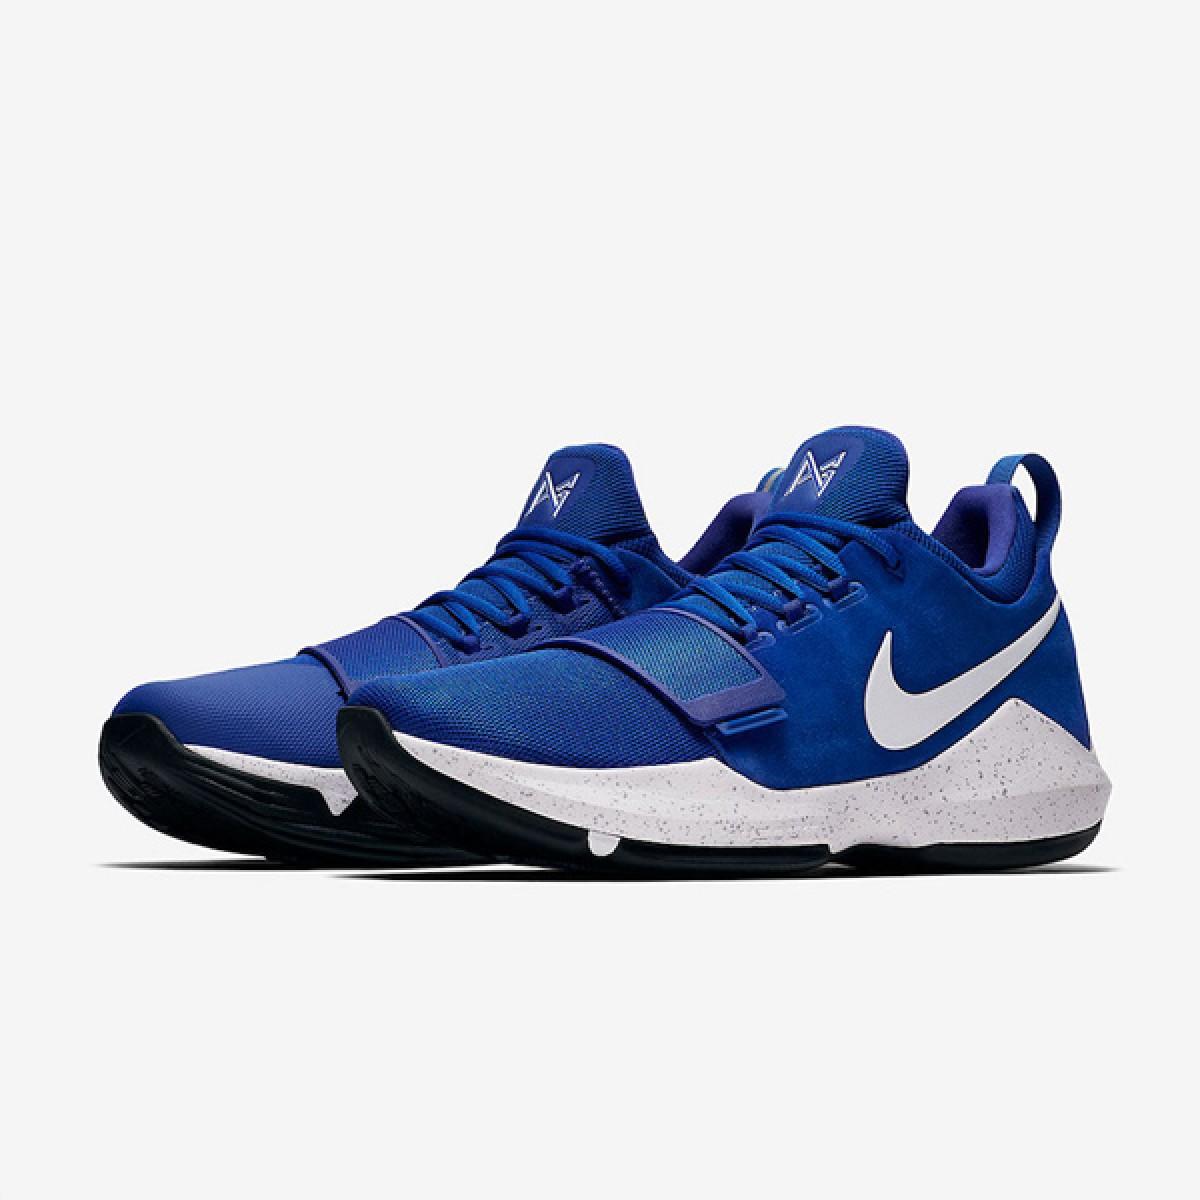 Nike PG 1 'Game Royal' 878627-400